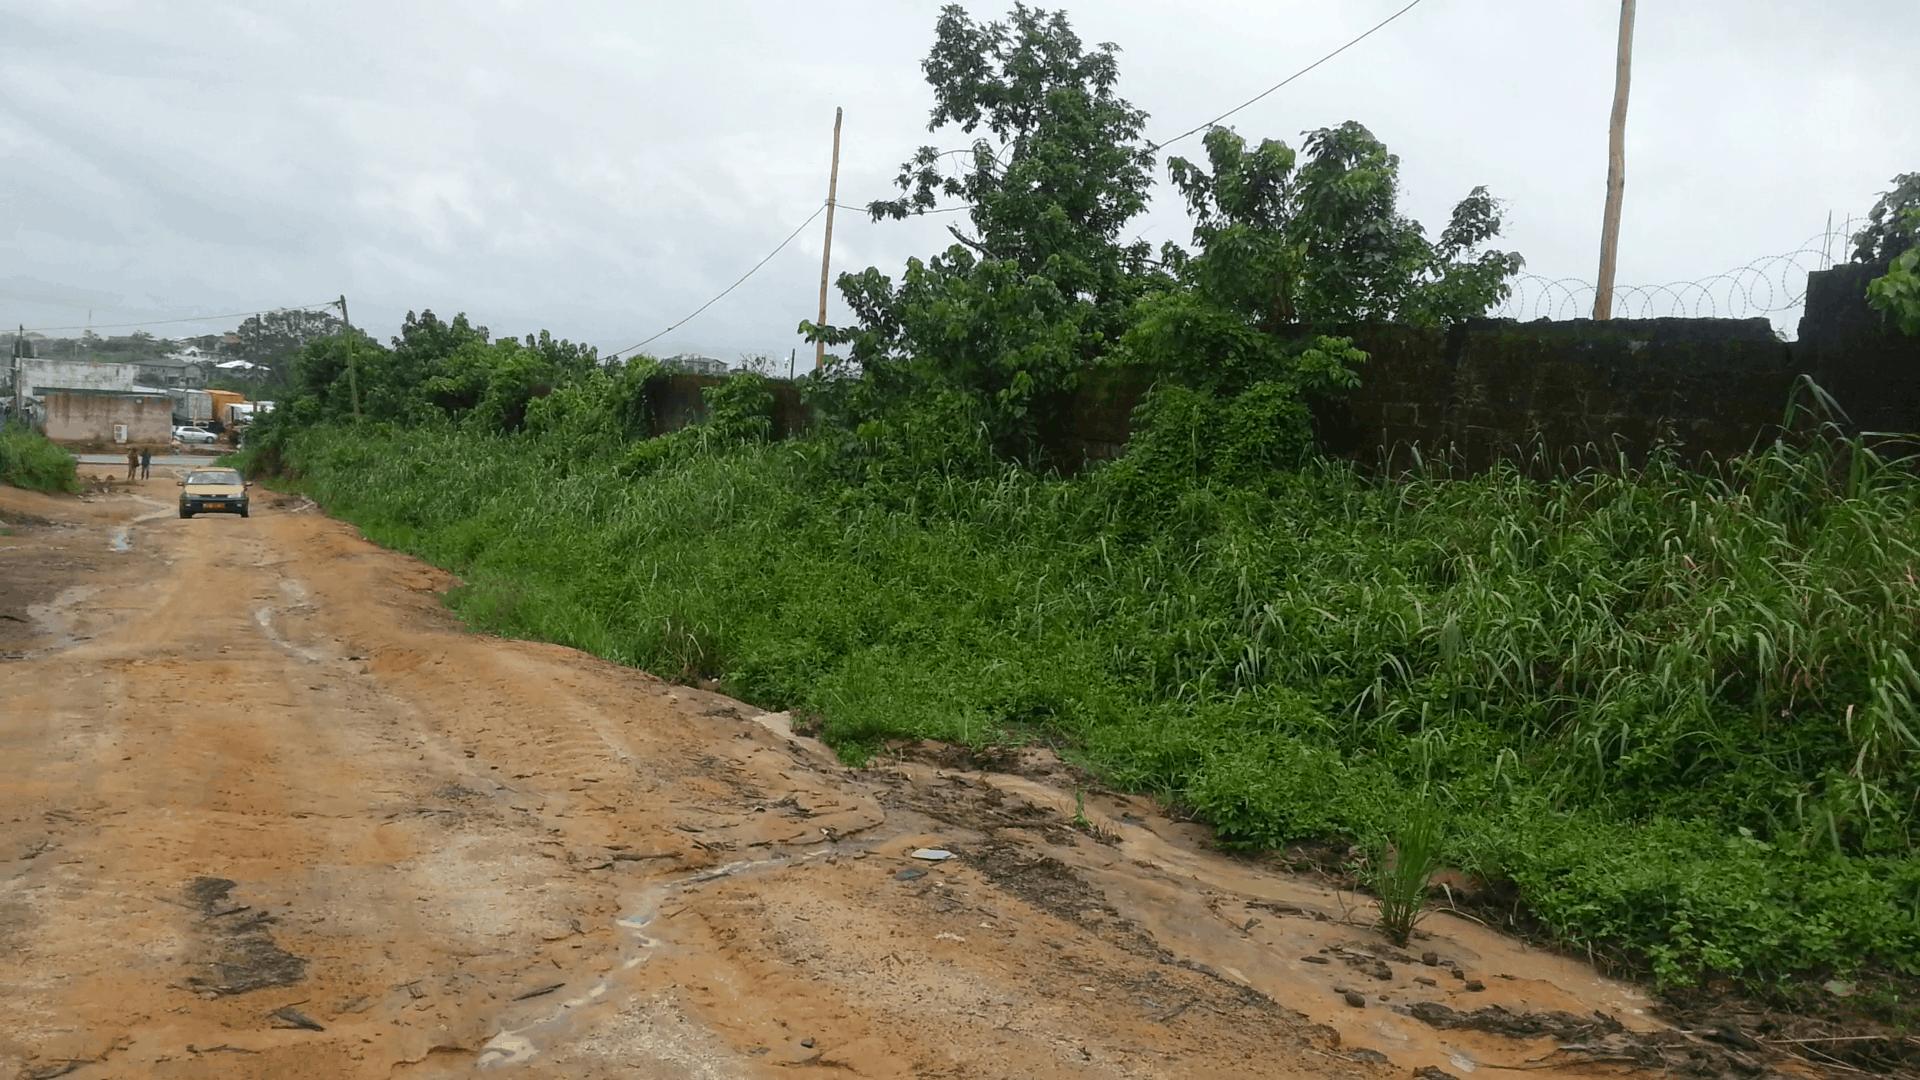 Land for sale at Douala, Yassa, après le stade Japoma - 30000 m2 - 2 100 000 000 FCFA